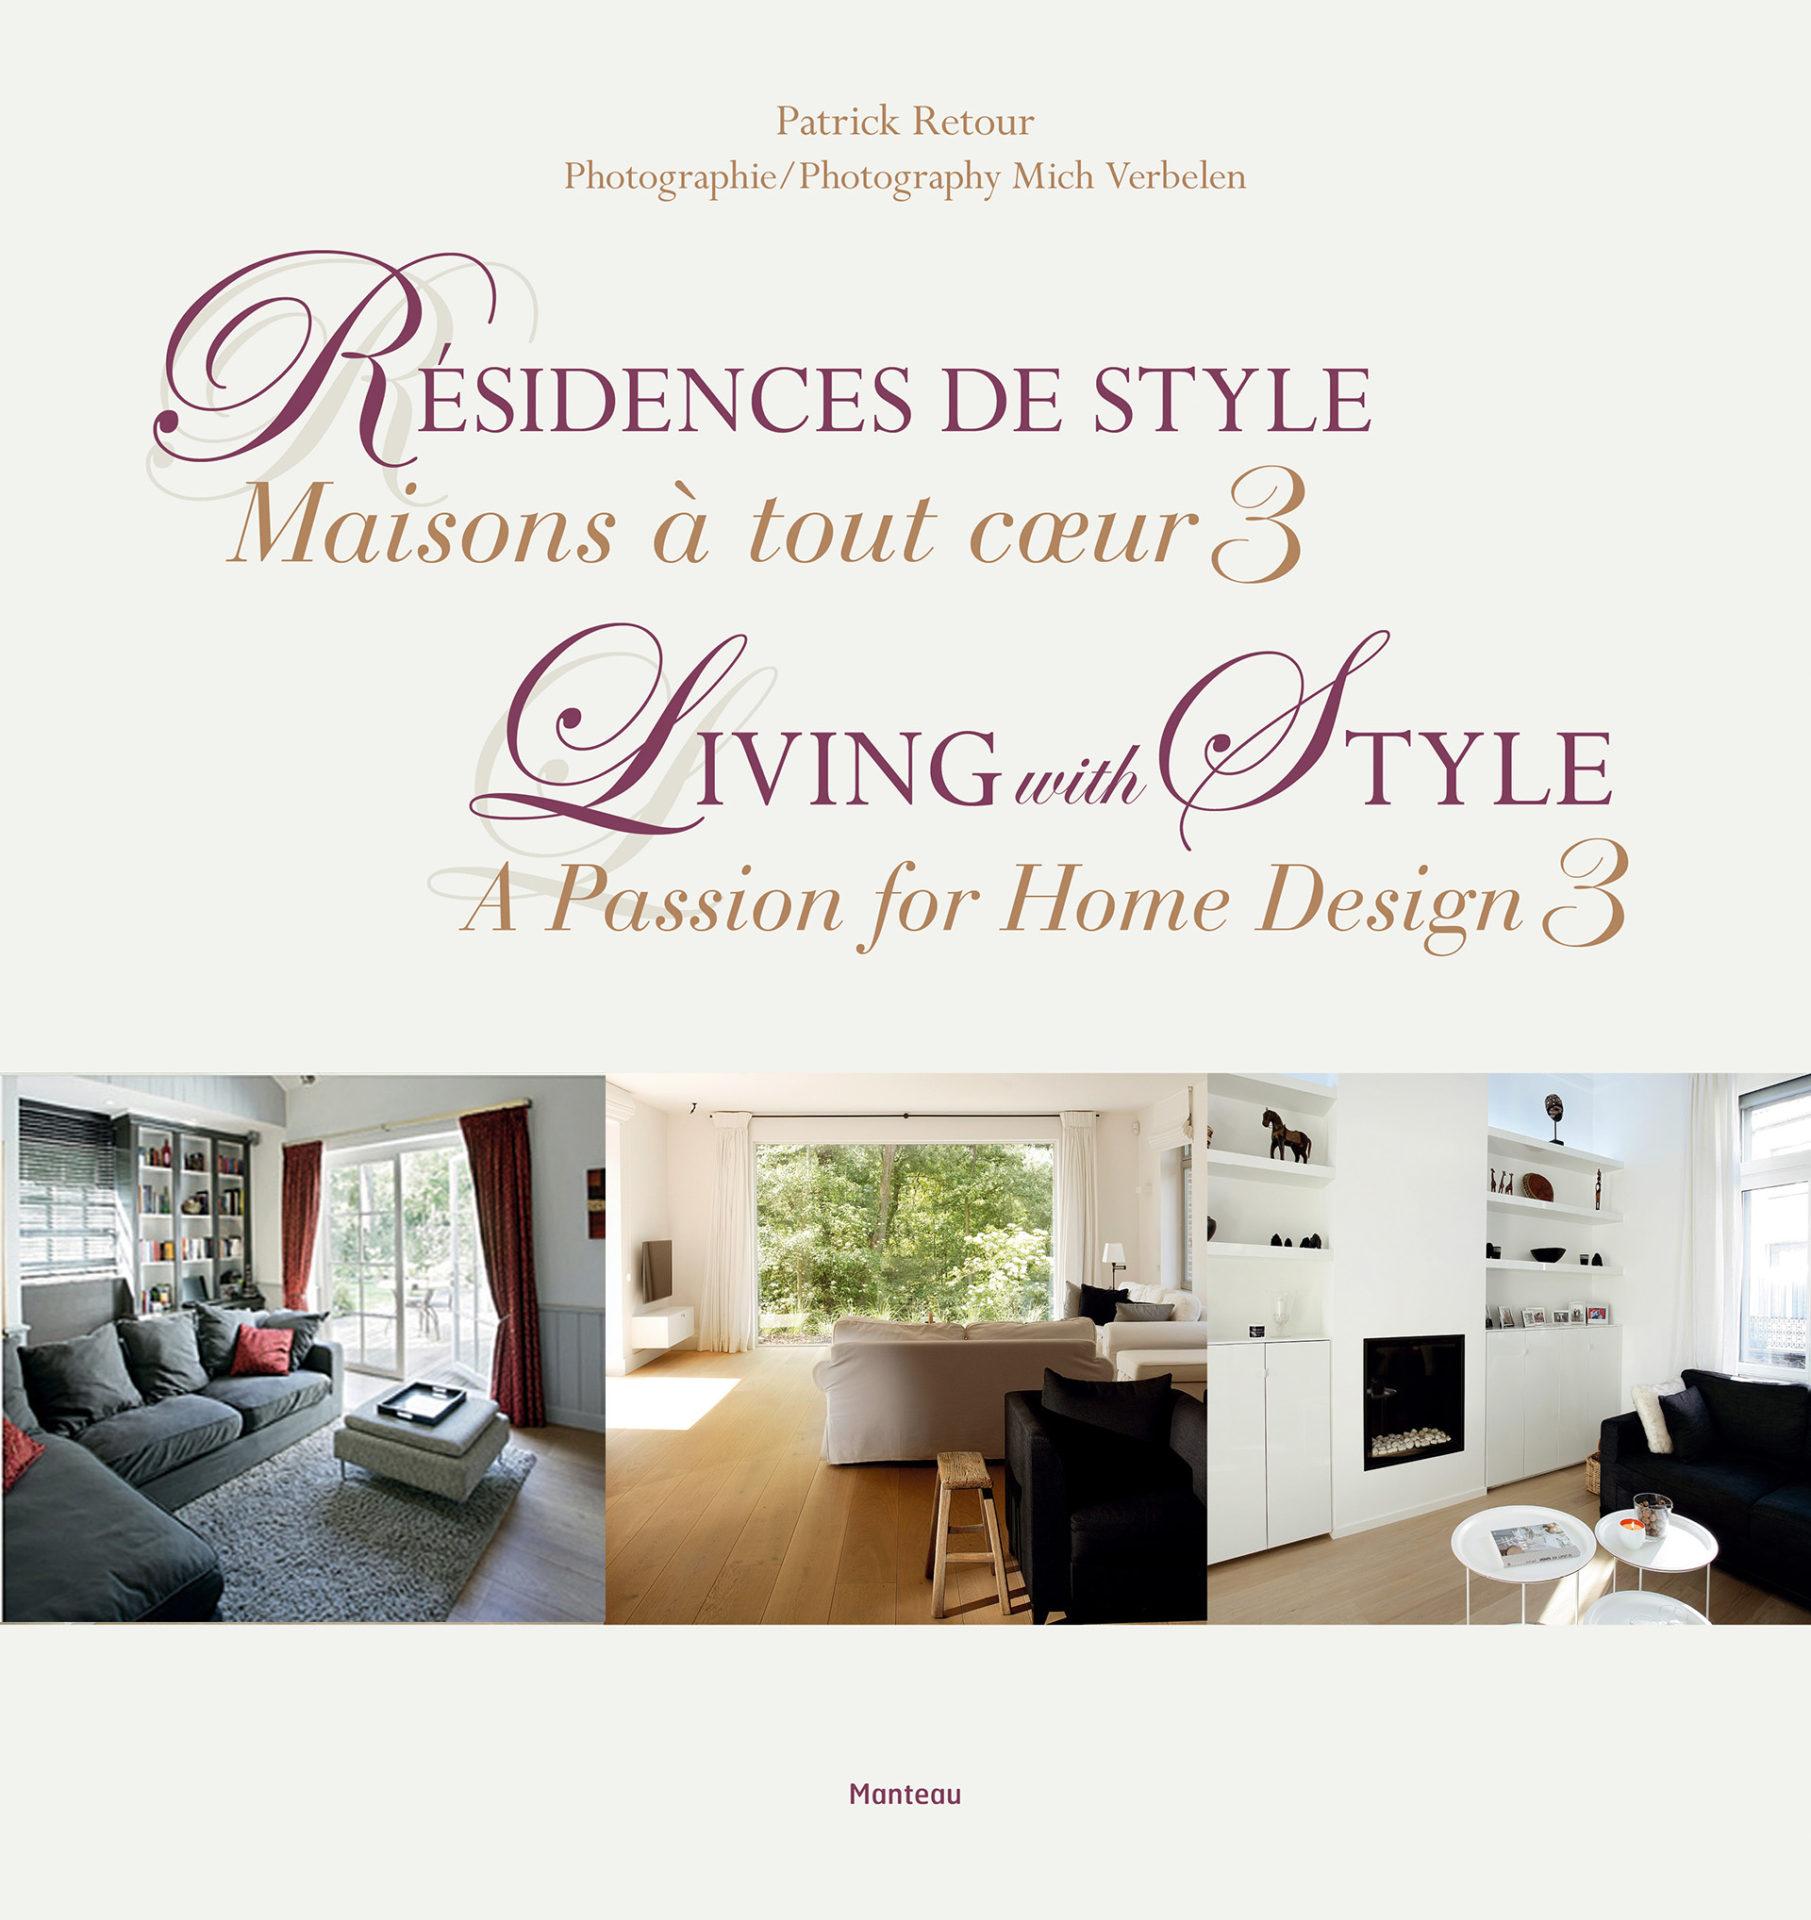 Living with style-villa in Schoten- 2016